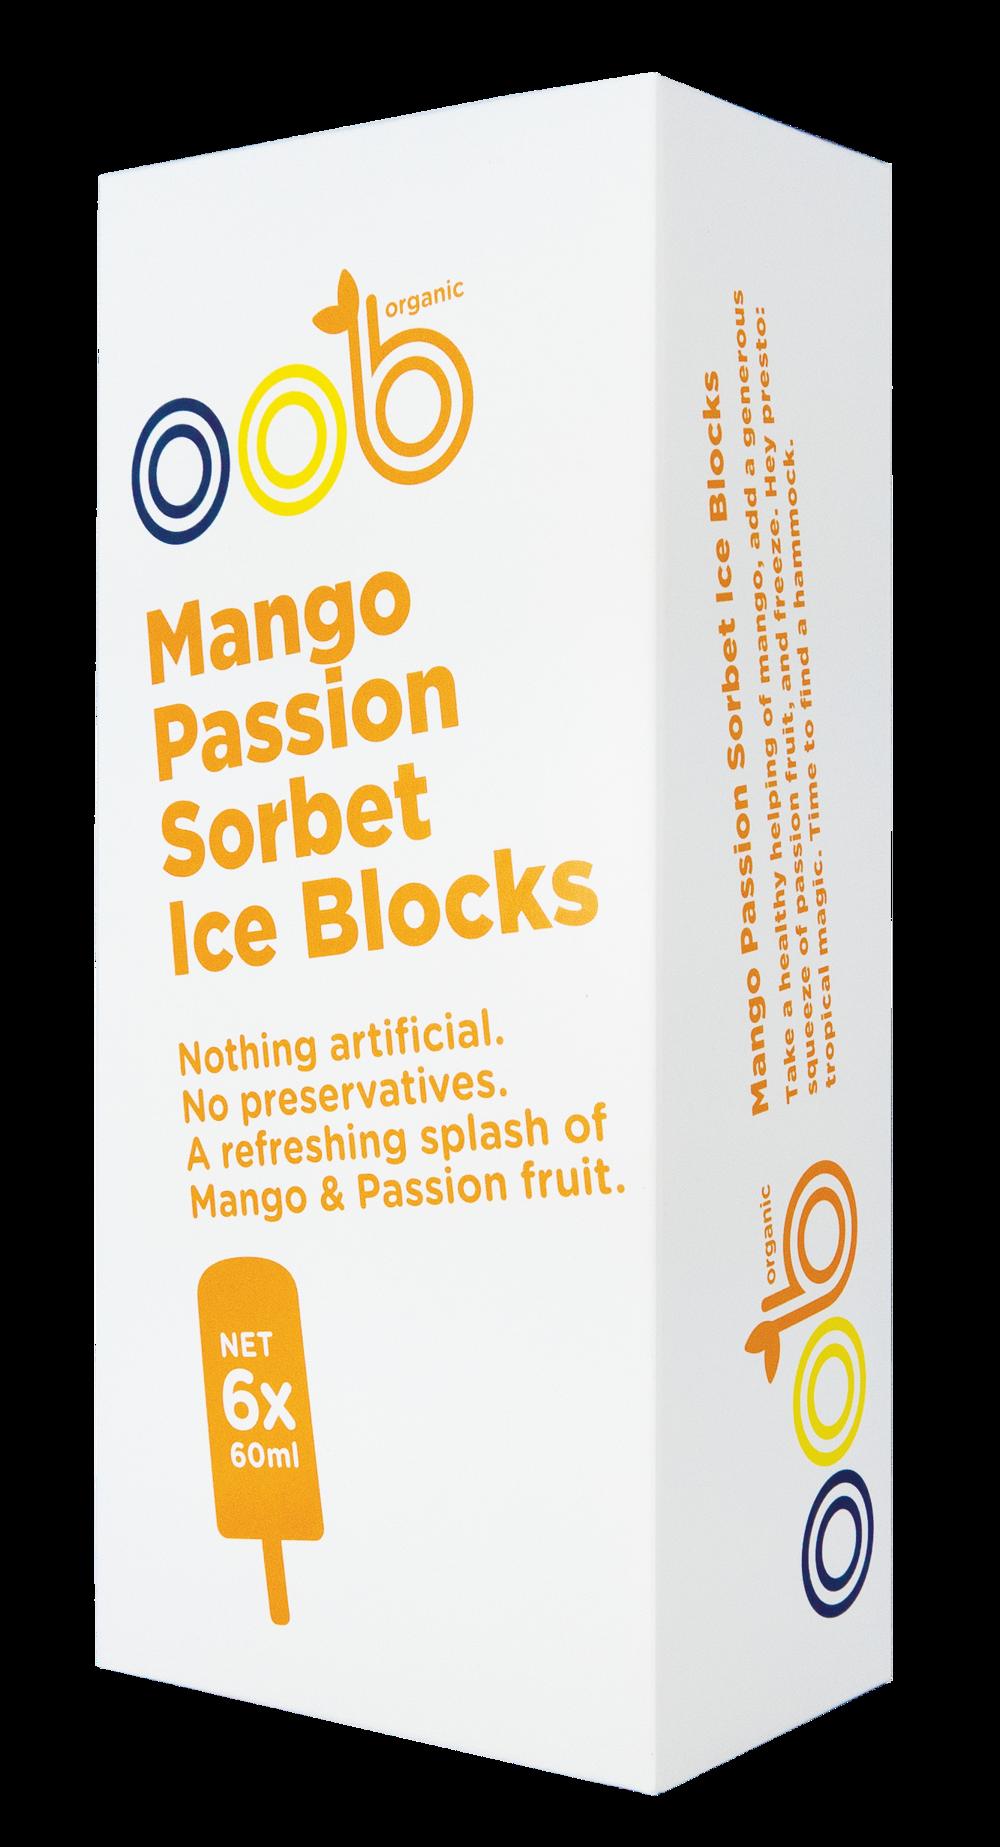 mango passion ice blocks box.png